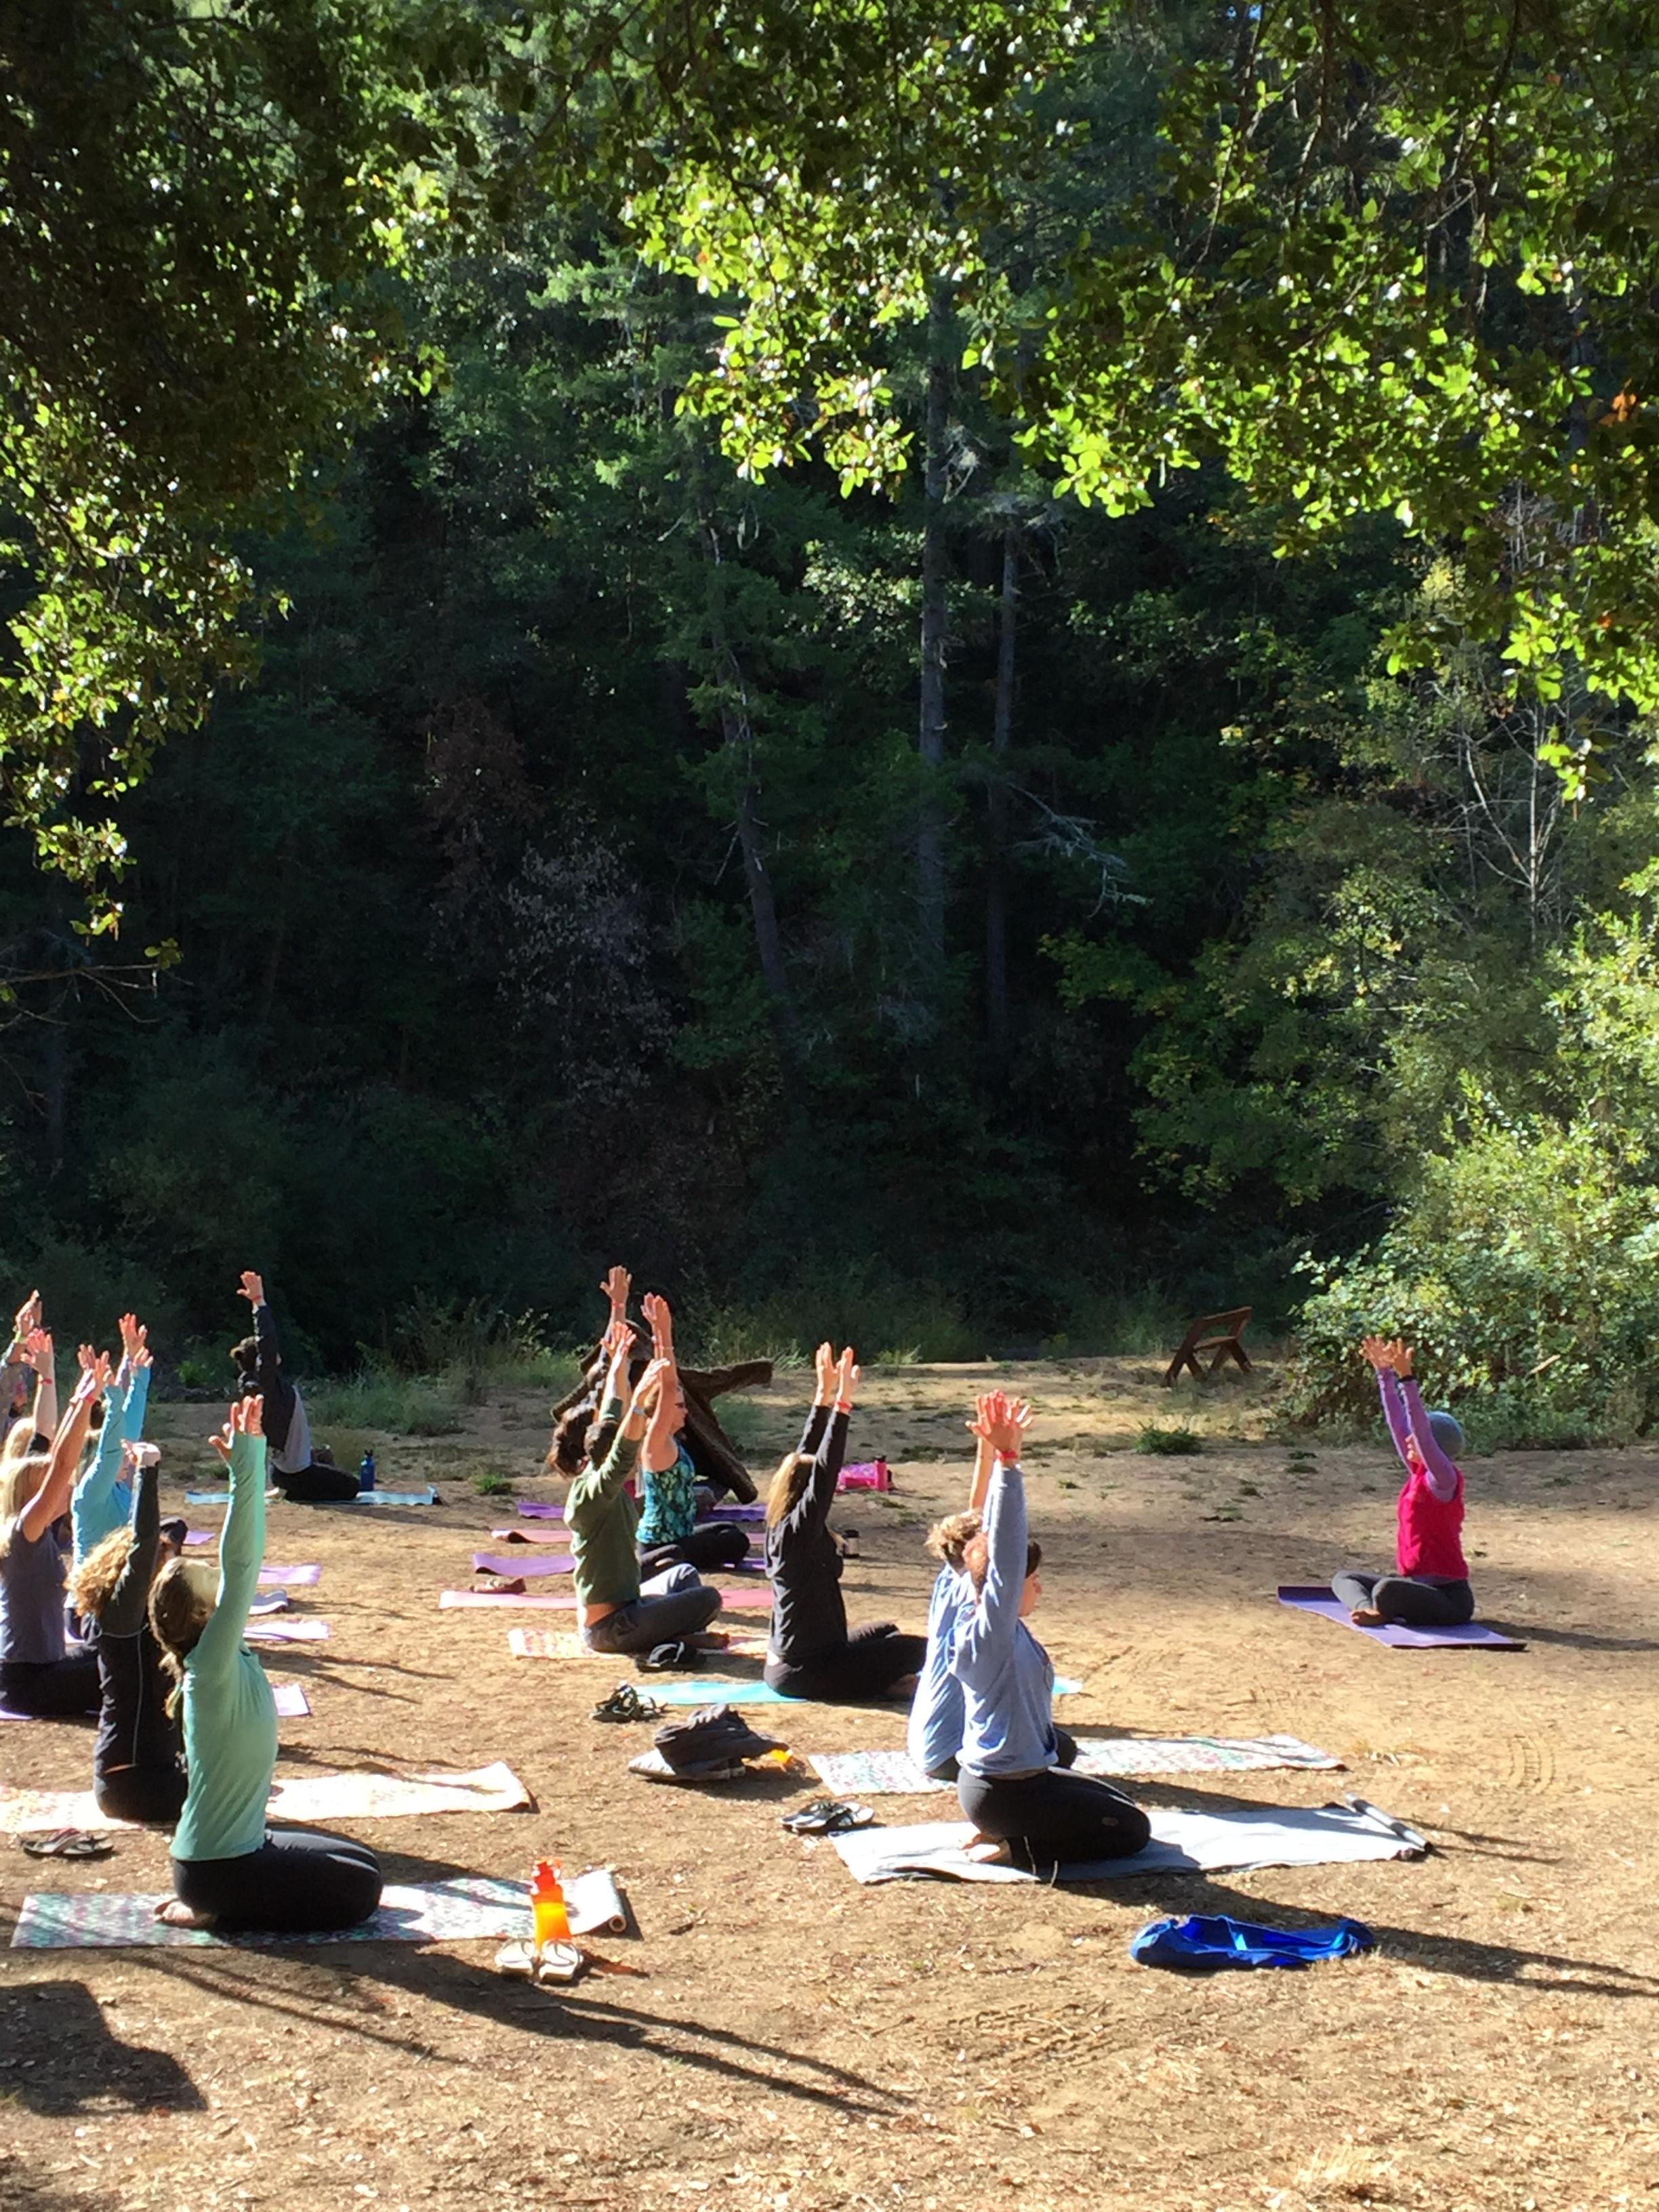 Camp Navarro_Yoga Session #2_Photo credit Dan Braun.JPG